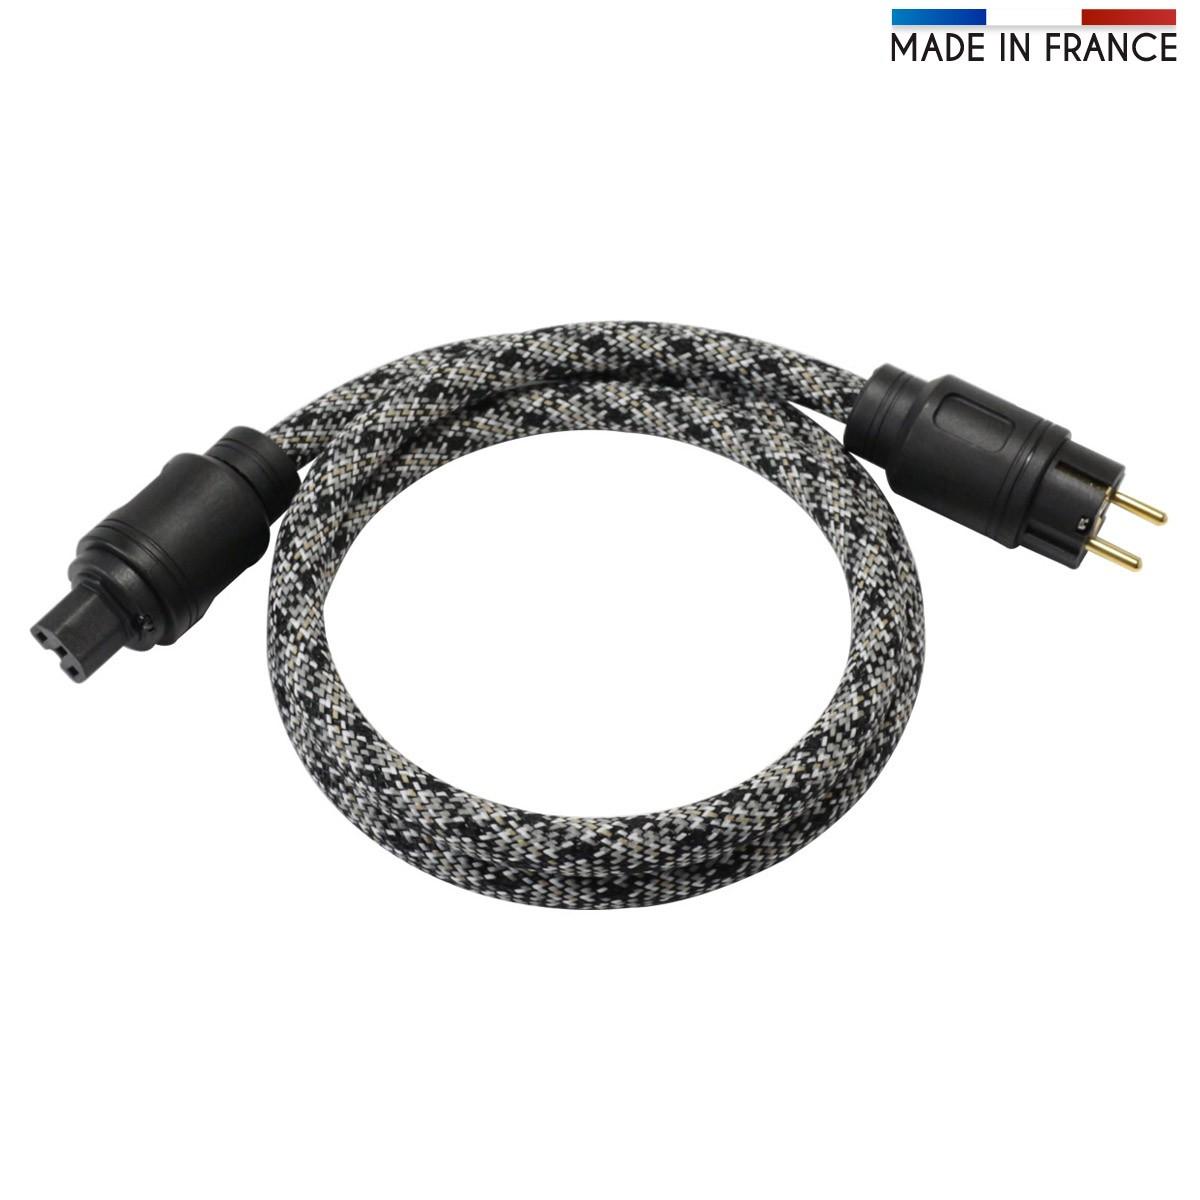 ELECAUDIO SILVER LINE MKII Câble Secteur OFC 3x3.5mm² C13 1.5m